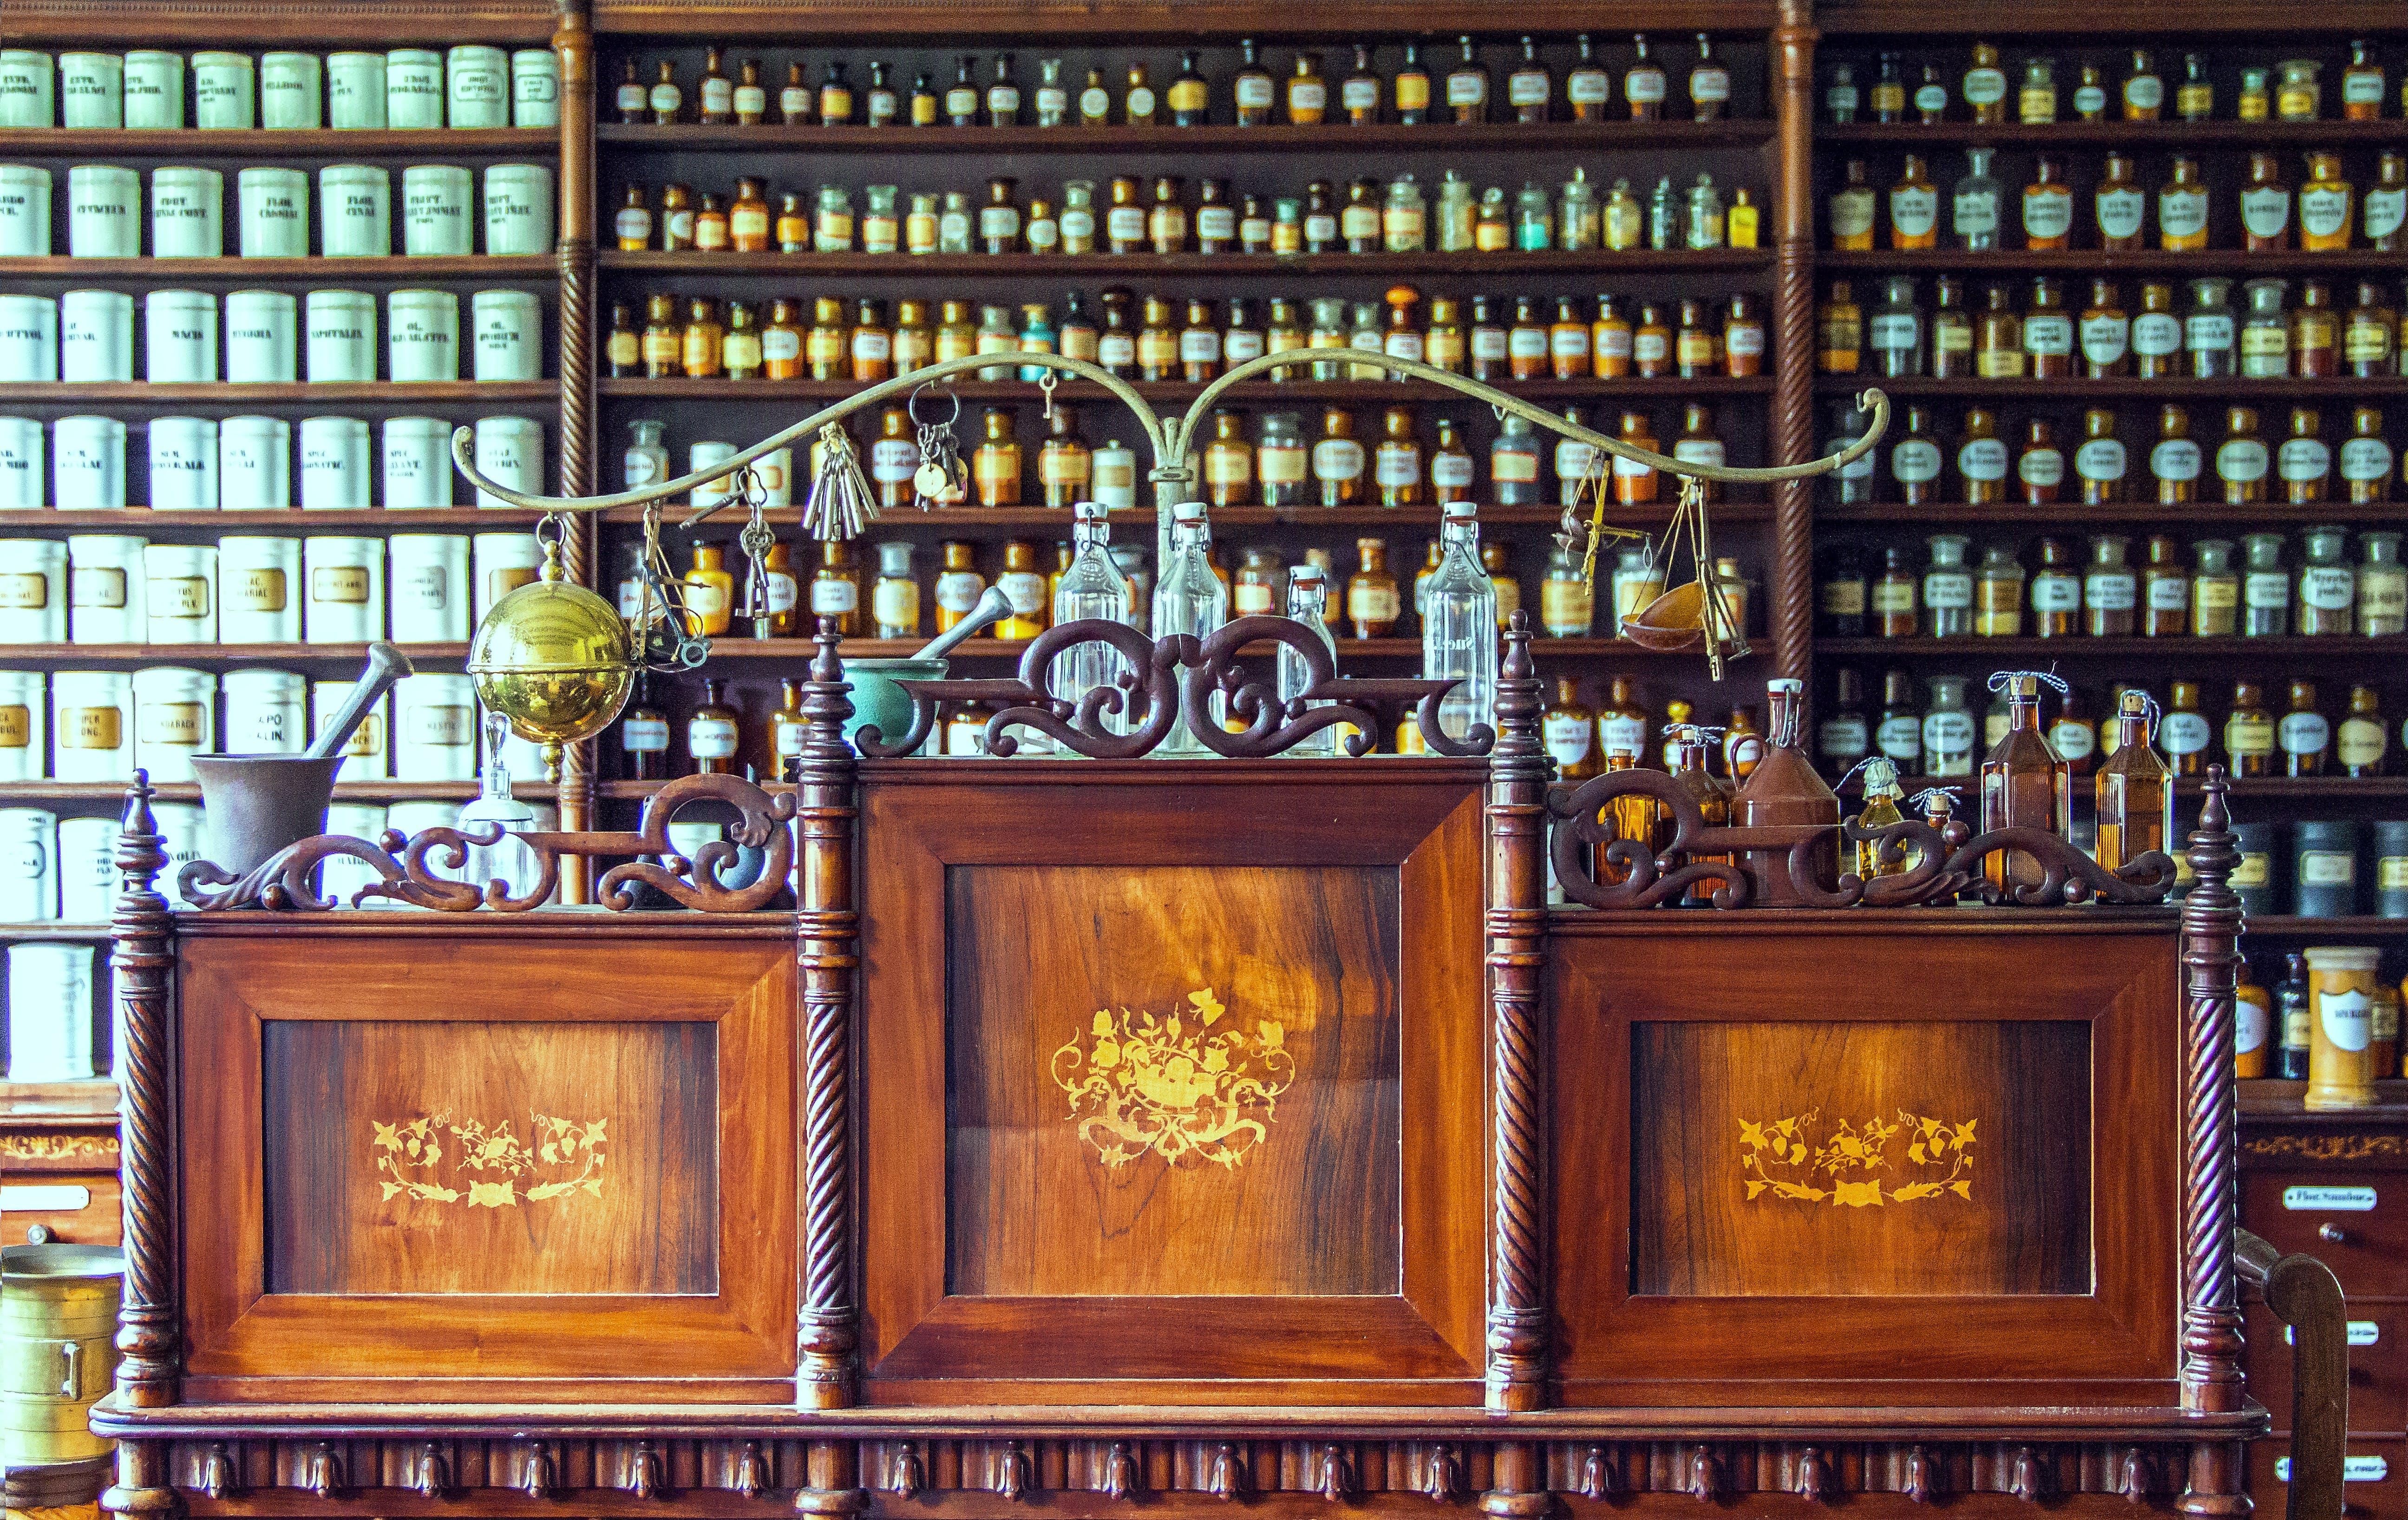 Free stock photo of wood, bar, bottles, vintage